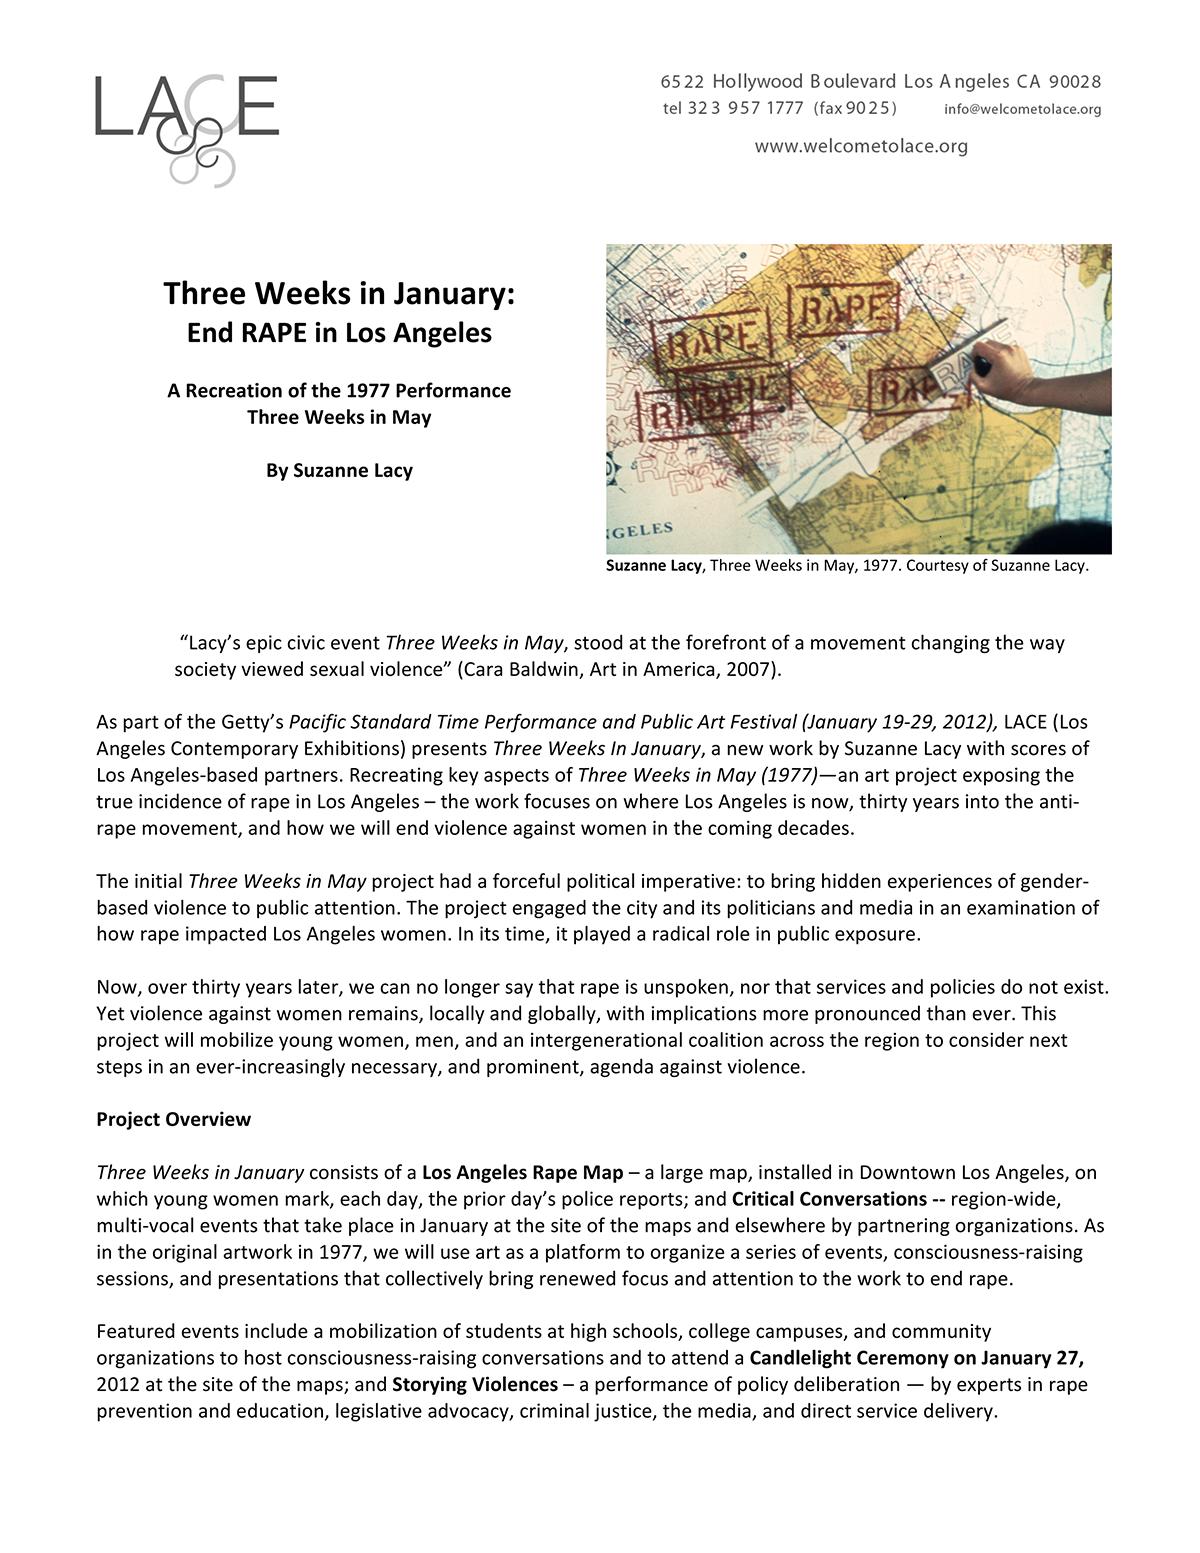 Three Weeks in January - Performance Description